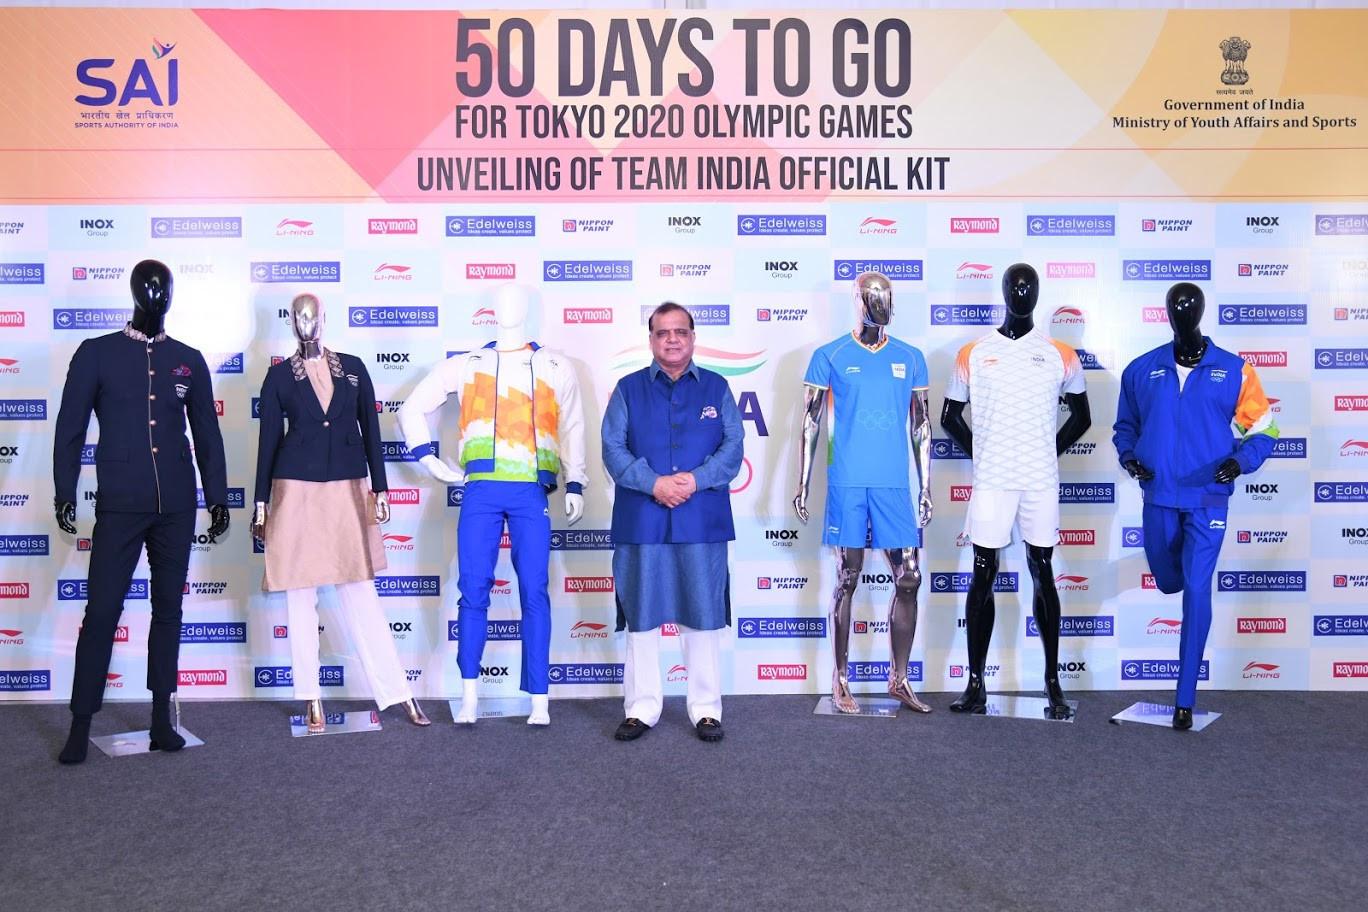 IOA President Narinder Batra was among the attendees at the launch ©Narinder Batra/Facebook